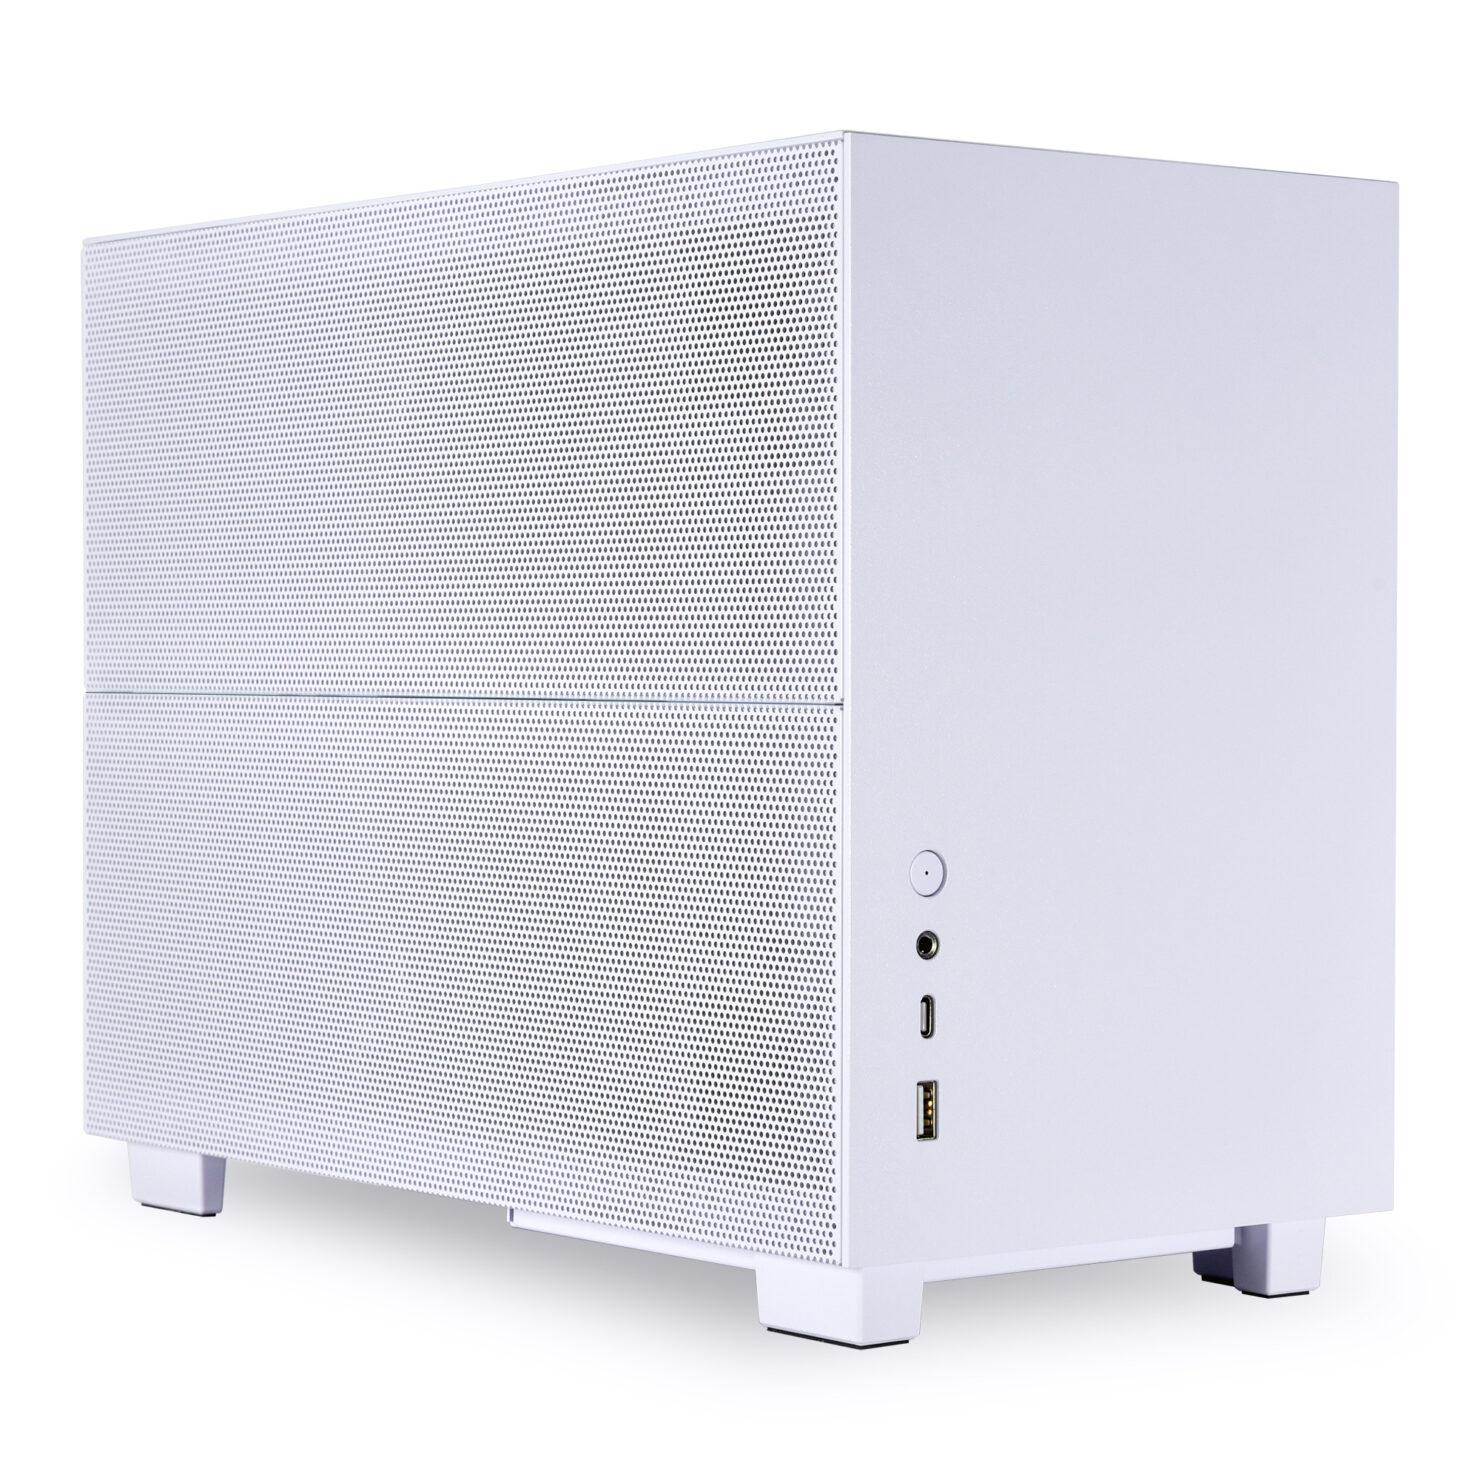 q58-mesh-panel-kit-02